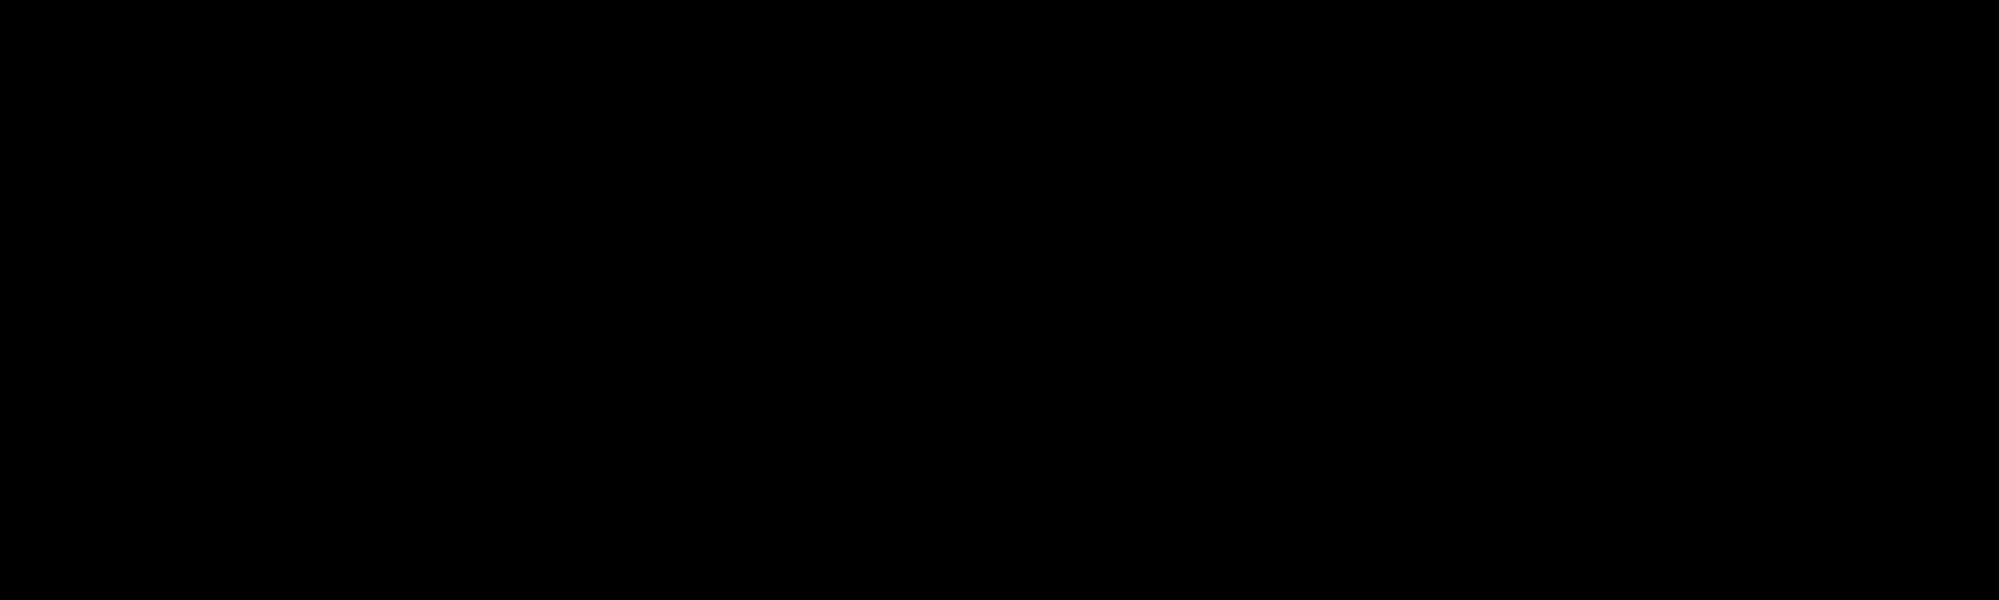 trezor logo in black with transparent background